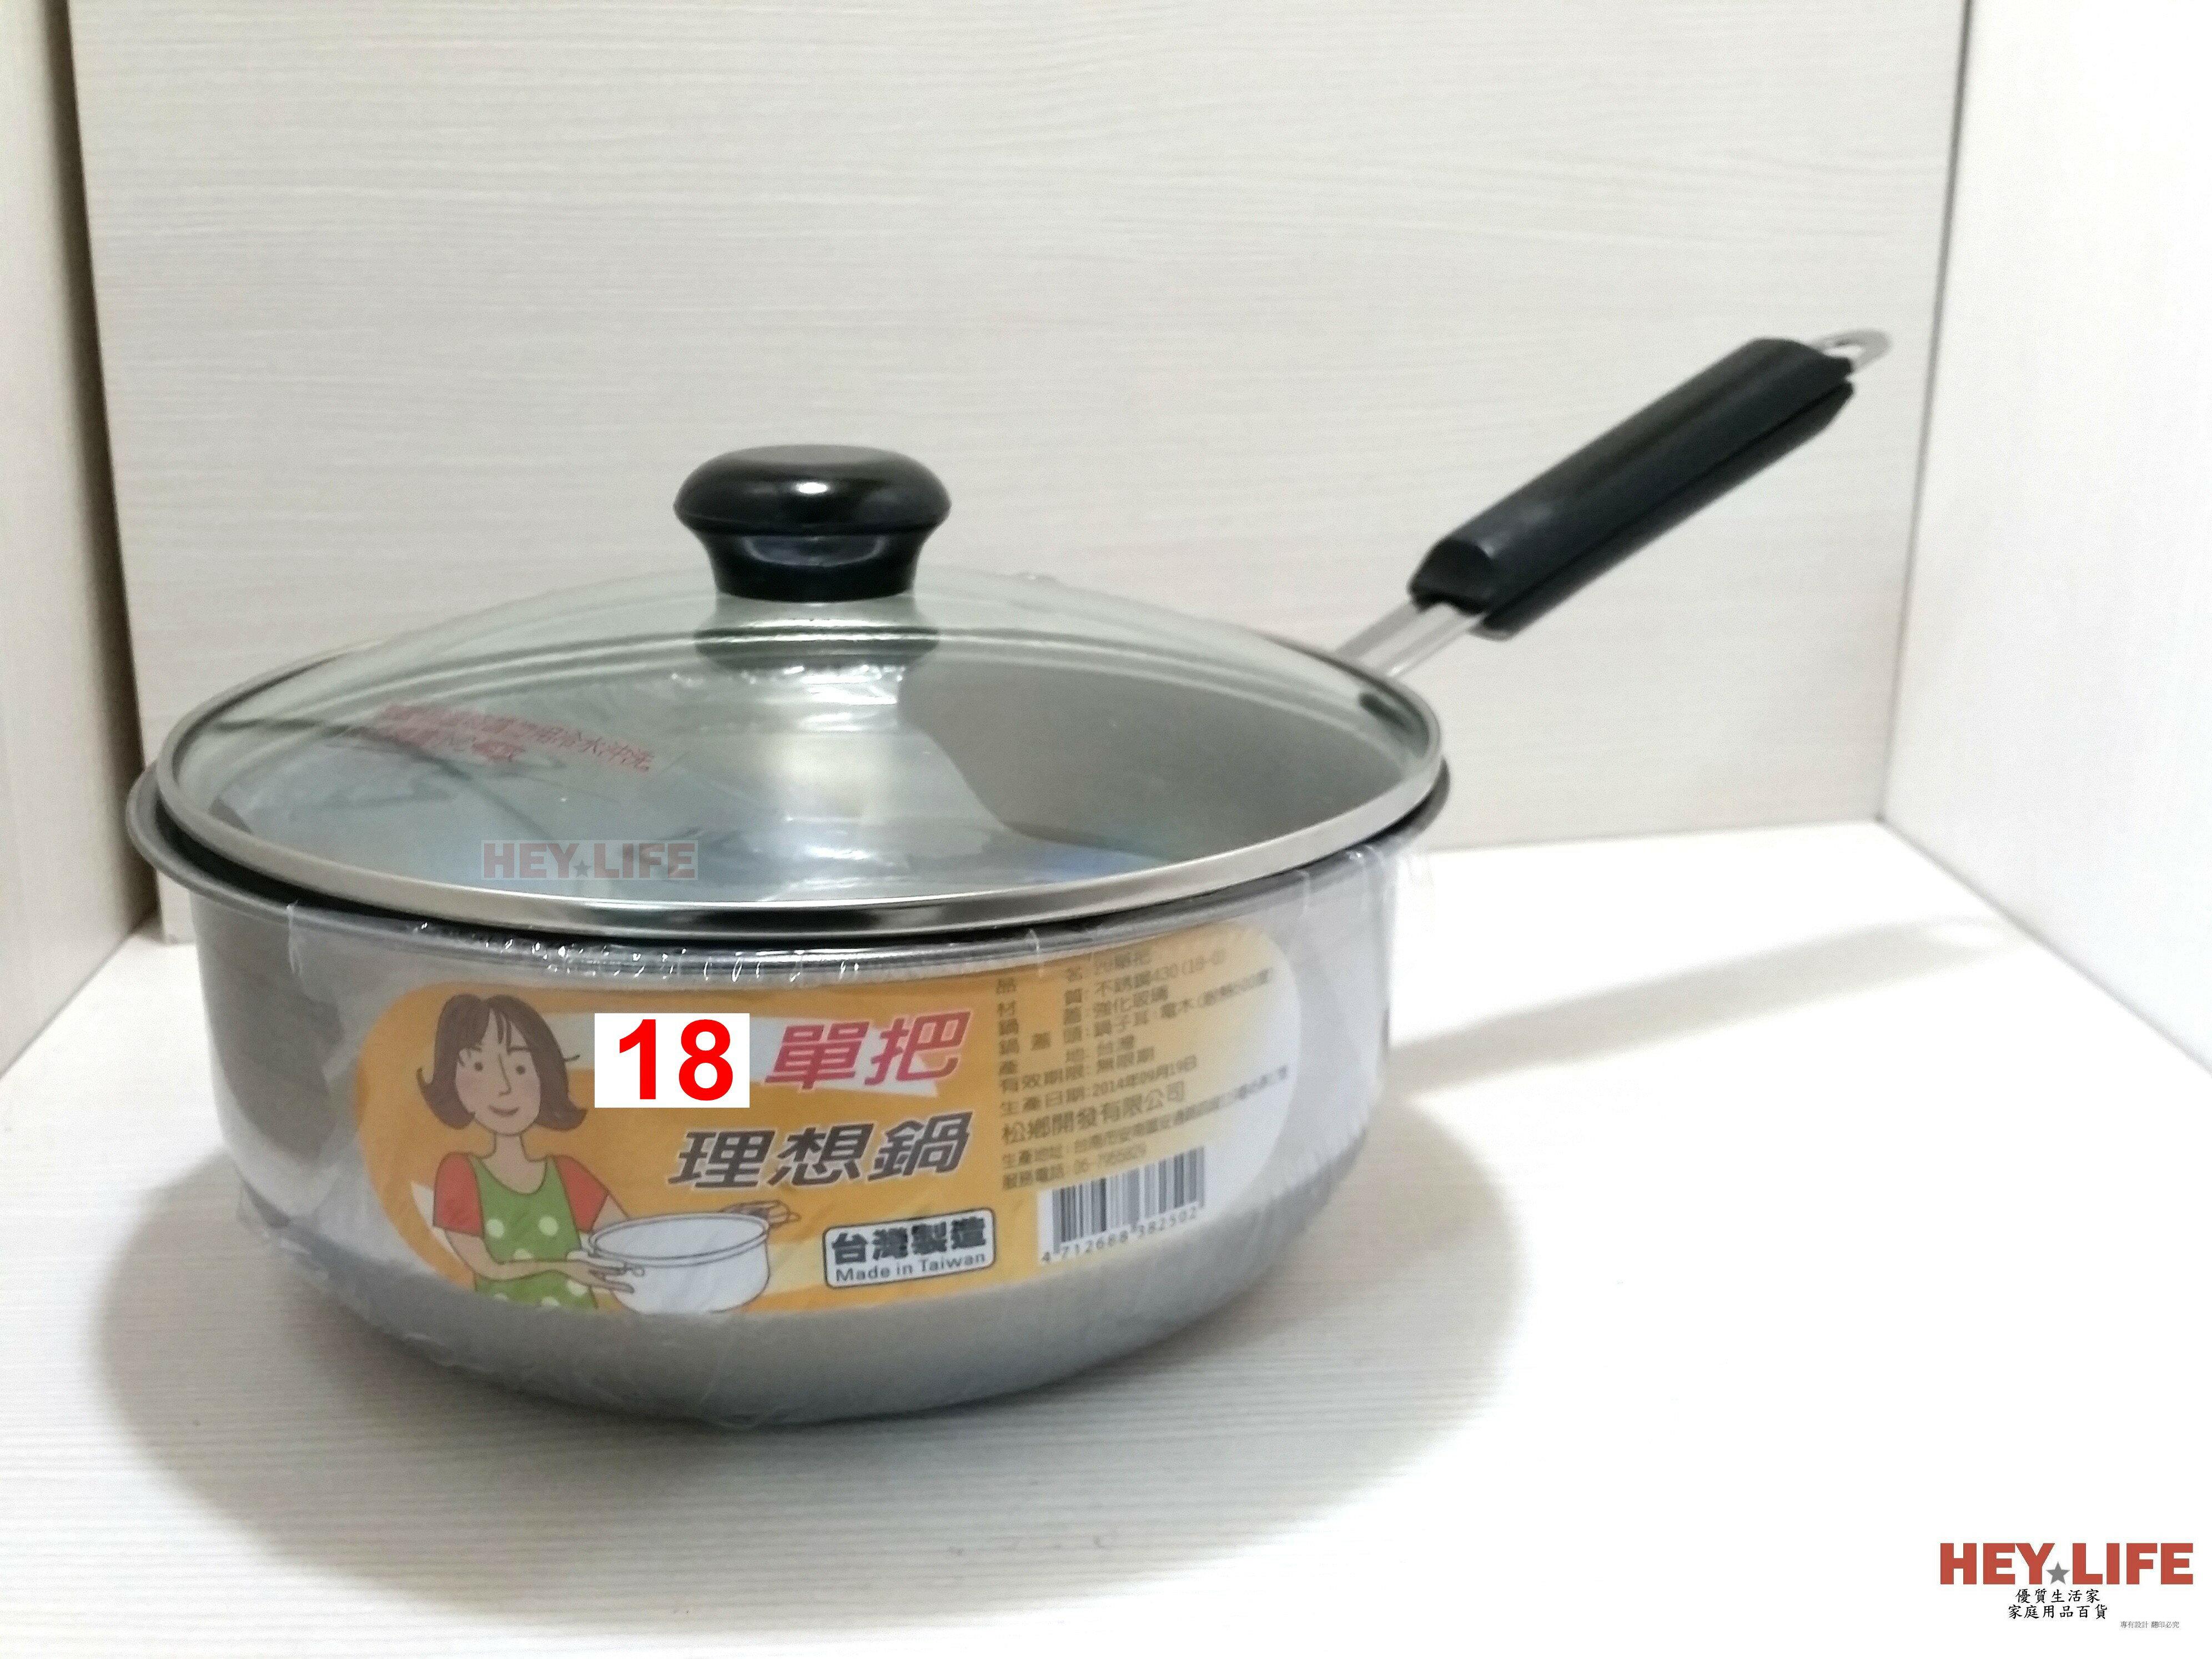 【HEYLIFE優質生活家】單把火鍋附蓋 18CM 理想鍋 鍋 台灣製造 優質嚴選 品質保證